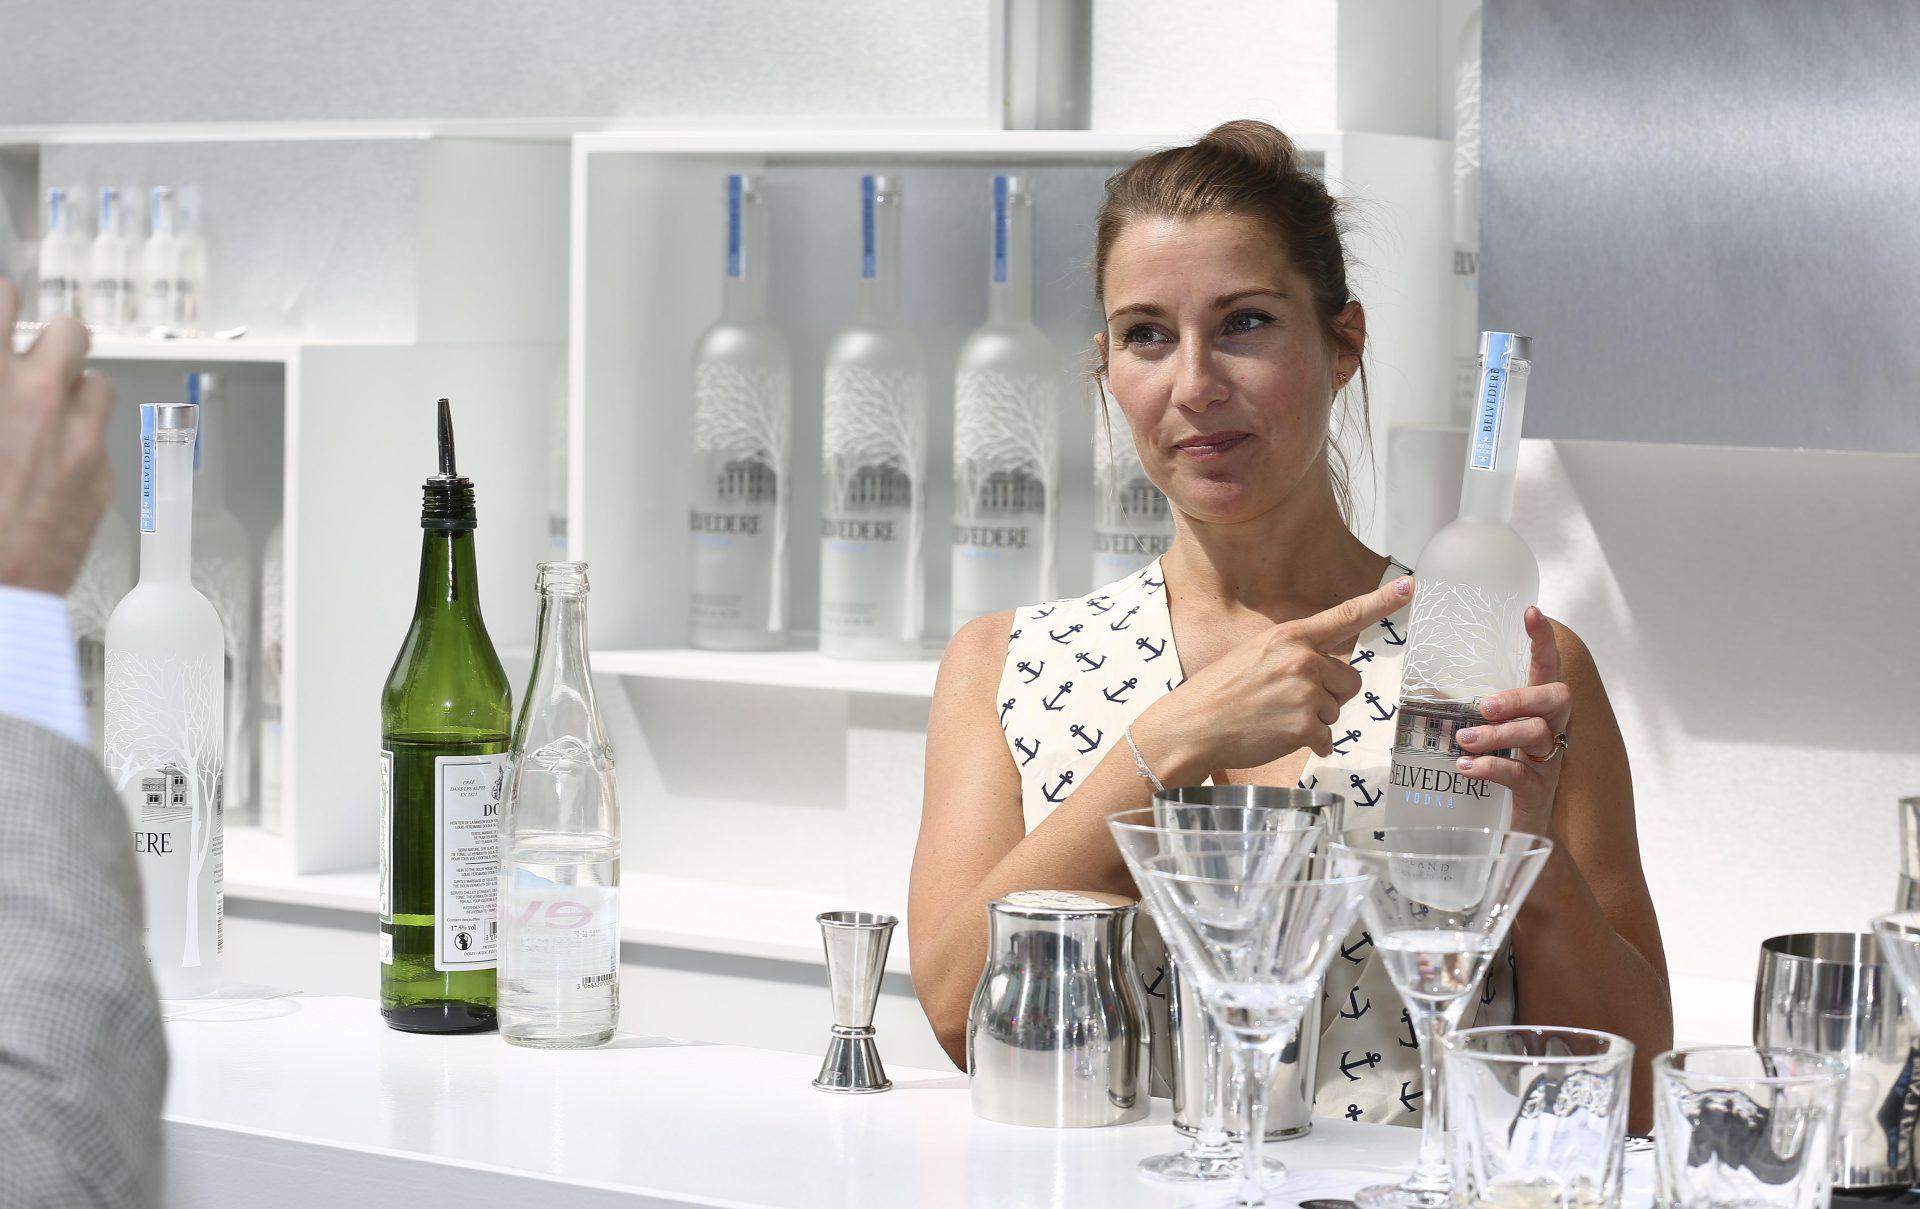 Regresa a lo natural con Belvedere Vodka